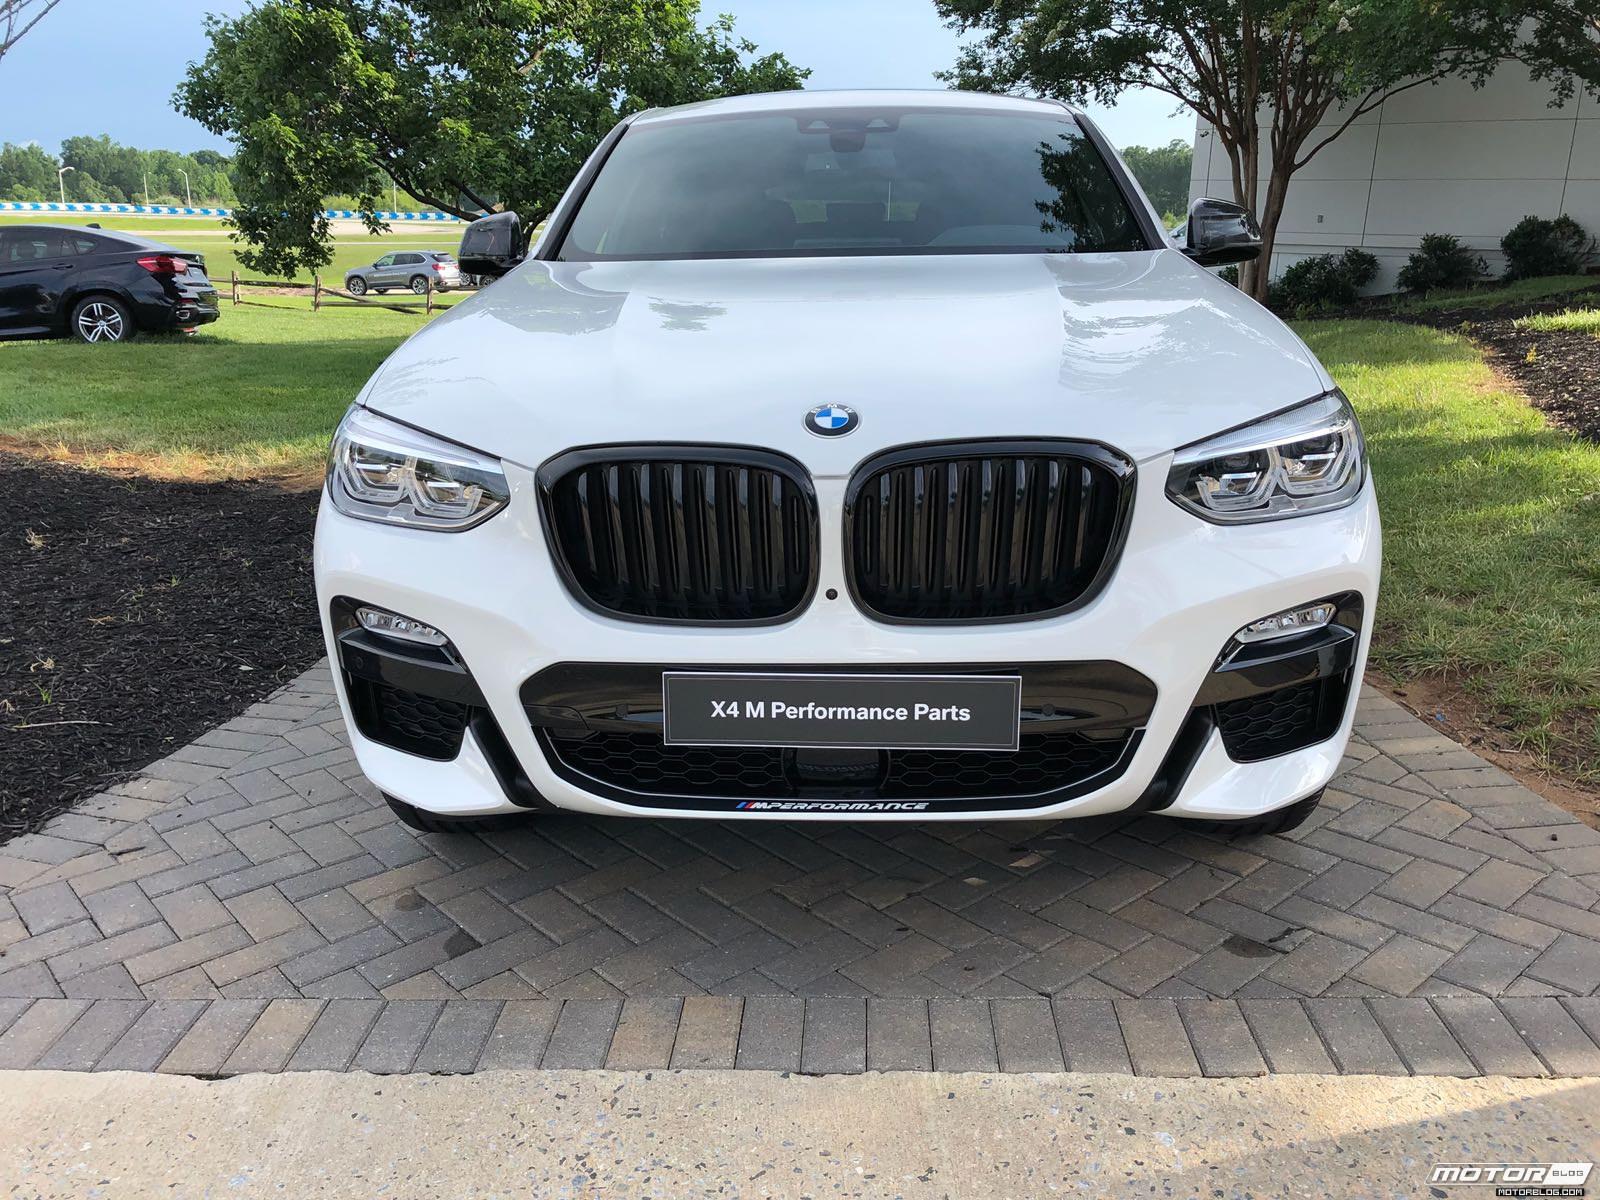 BMW x4 2018 Premiere Spartanburg media event 6